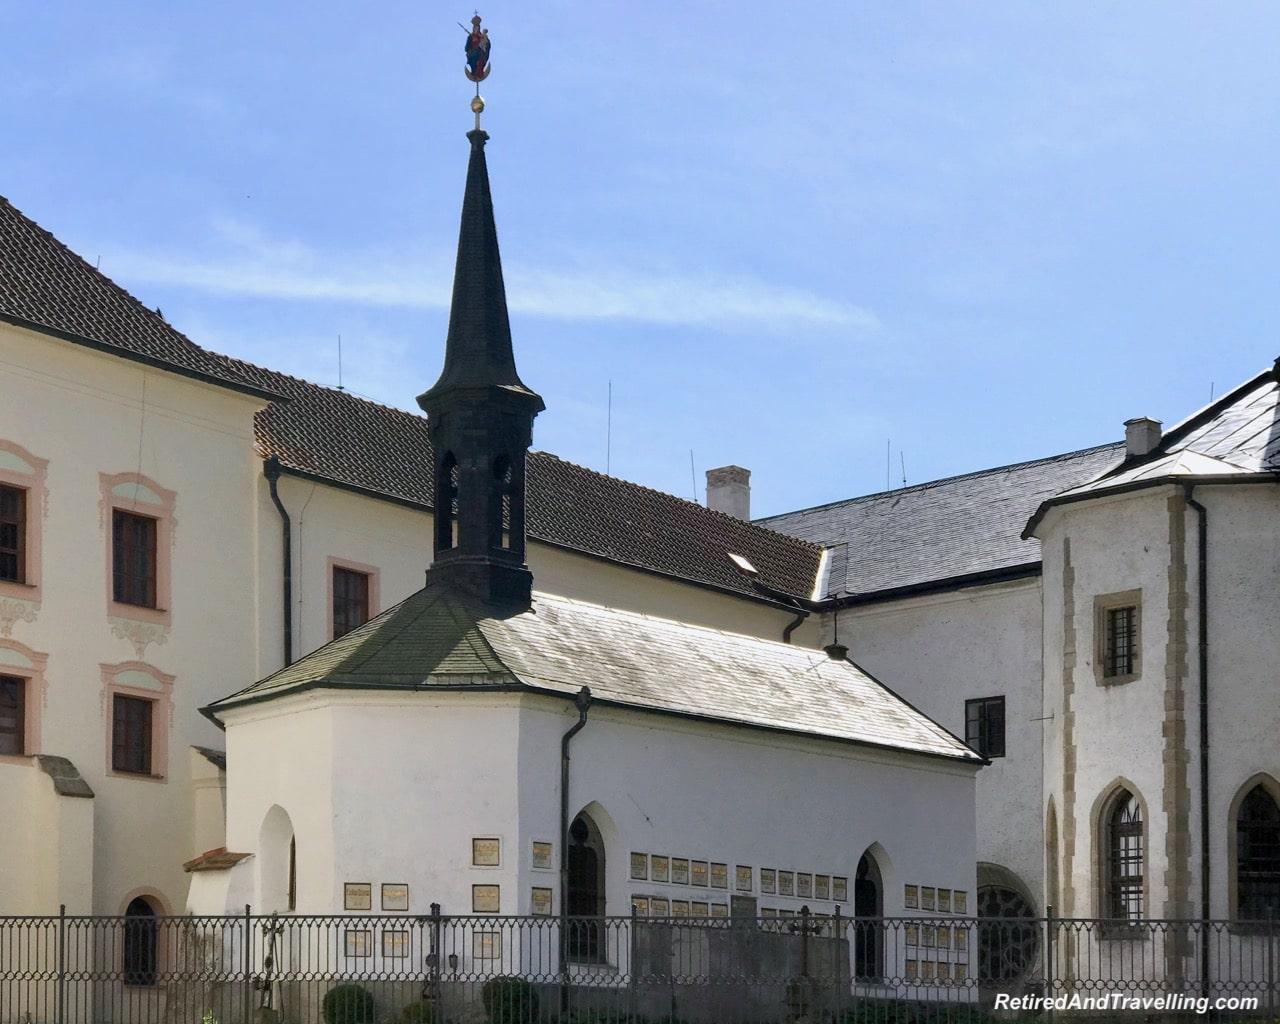 Rozmberk Vyssi Brod Cistercian Abbey Church - Churches And Castles In The Czech Republic.jpg